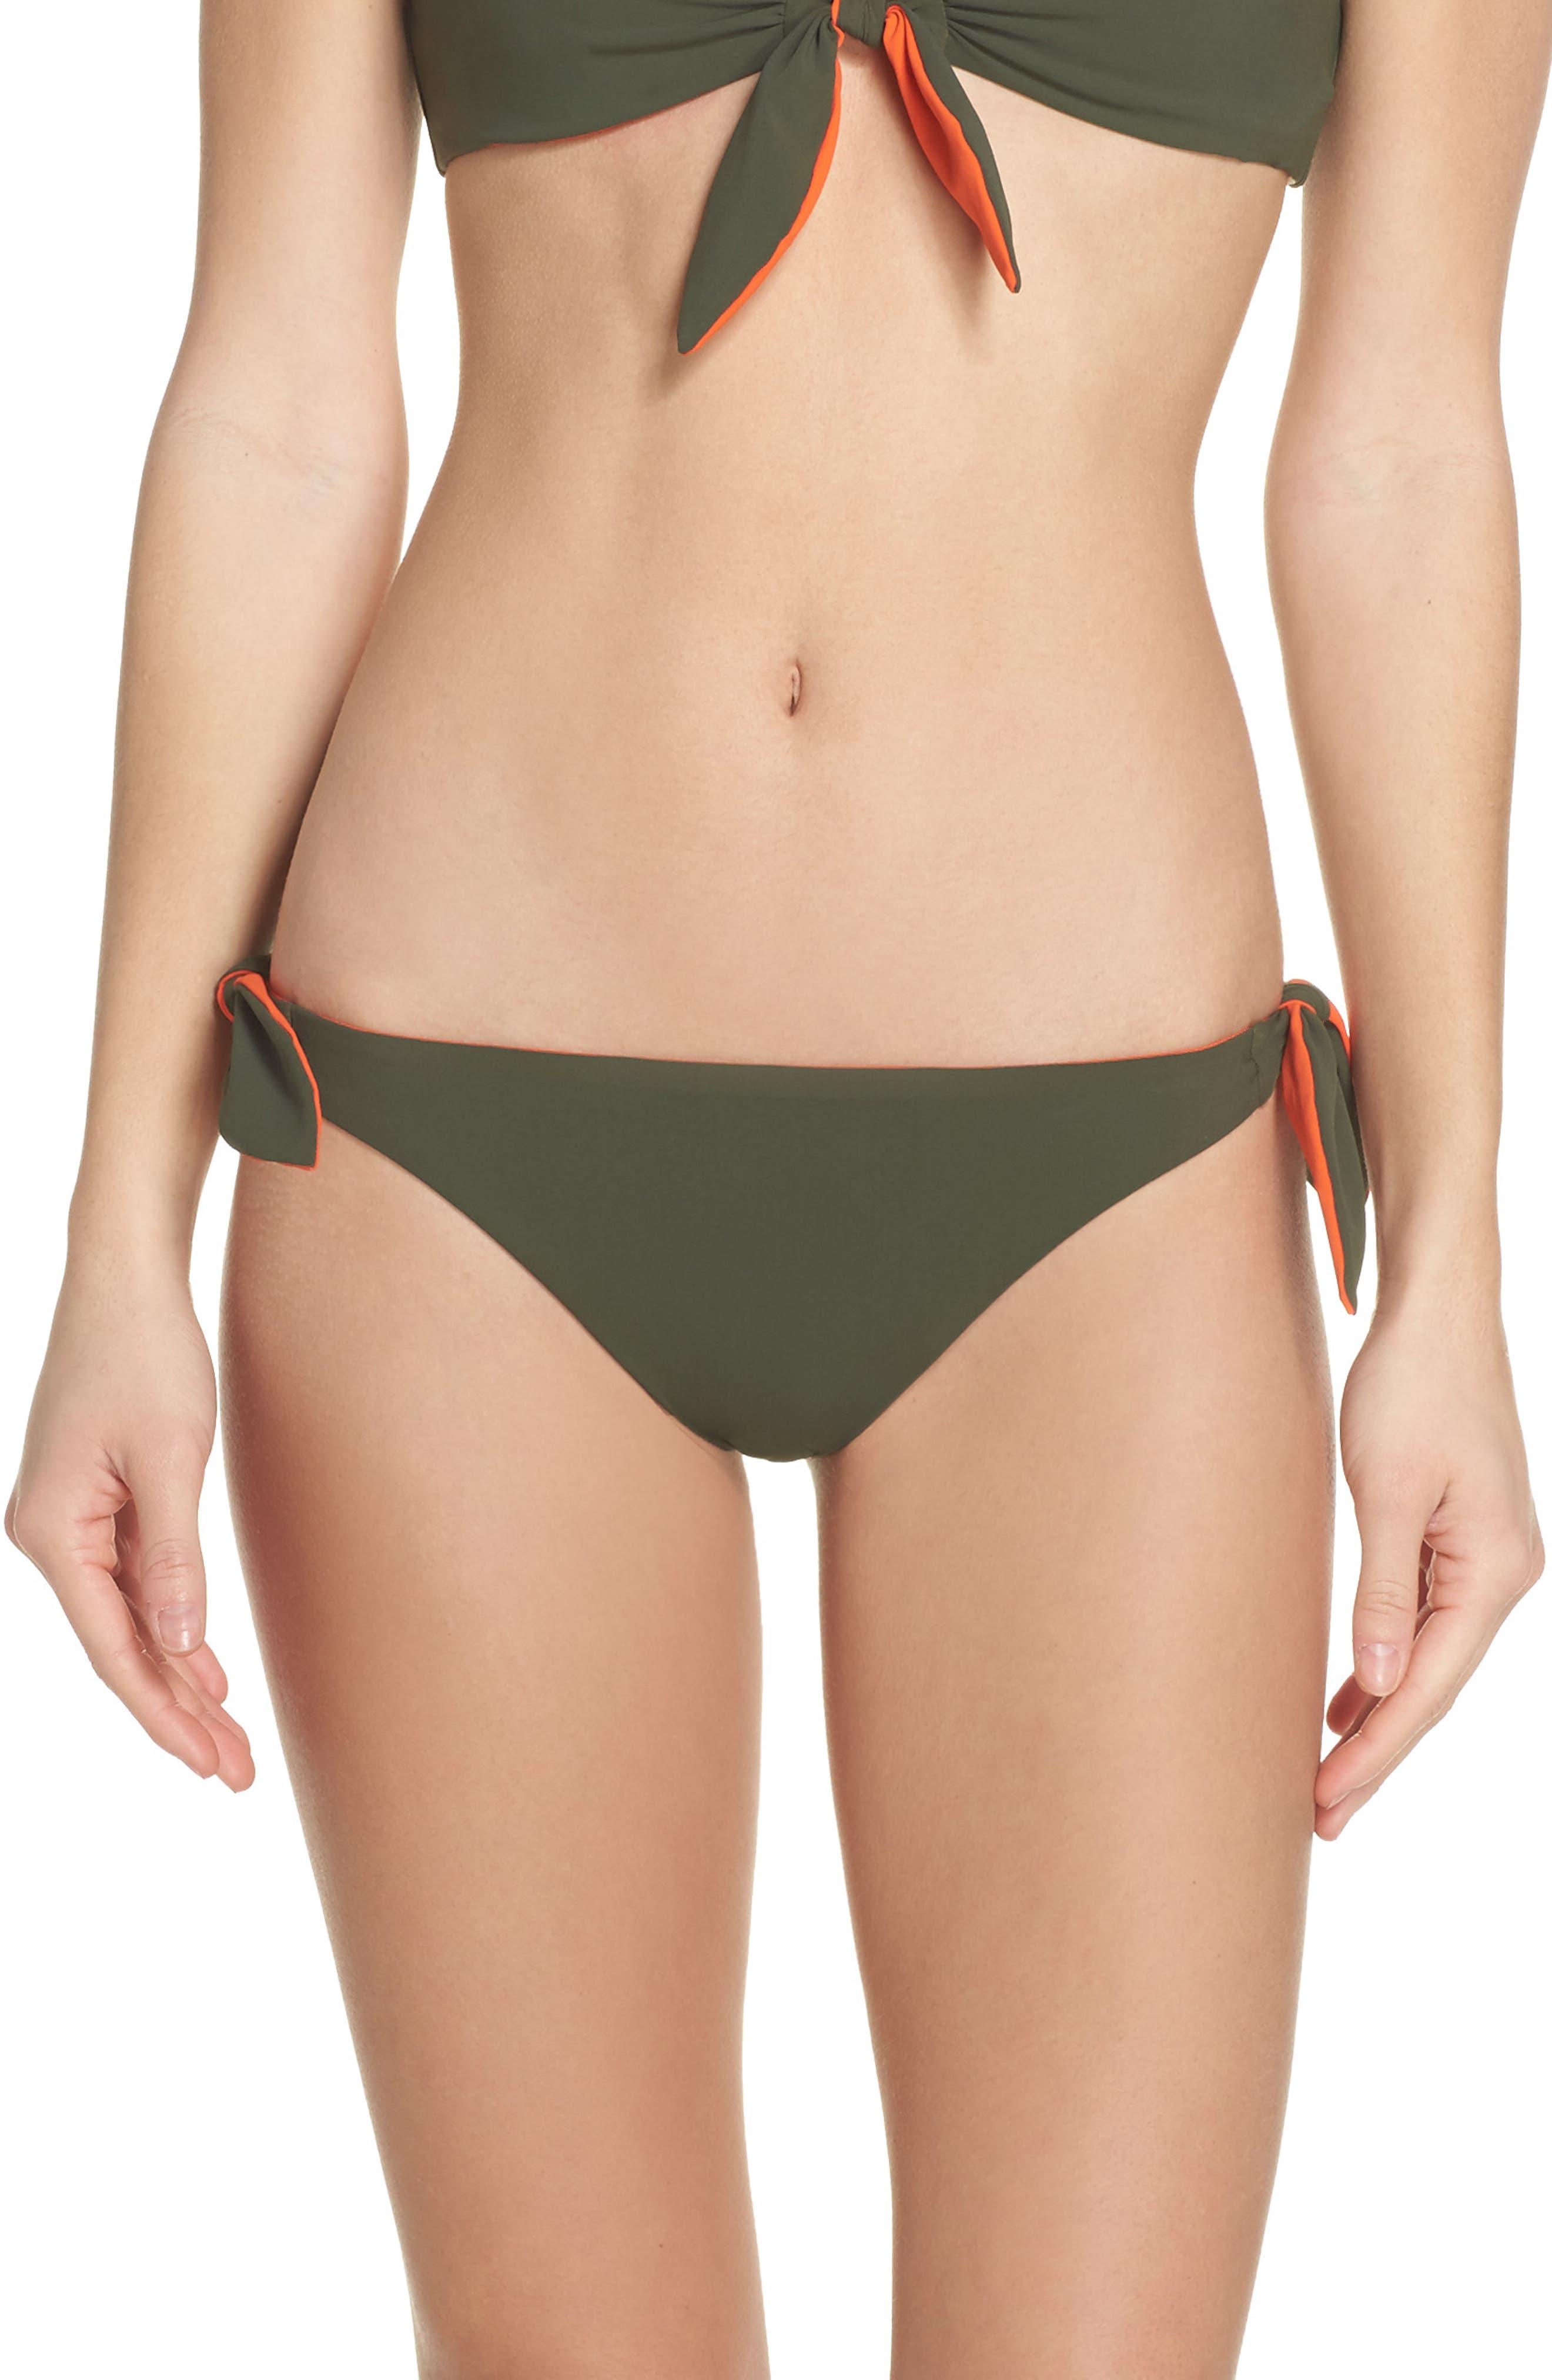 Biarritz Reversible Bikini Bottoms,                             Main thumbnail 1, color,